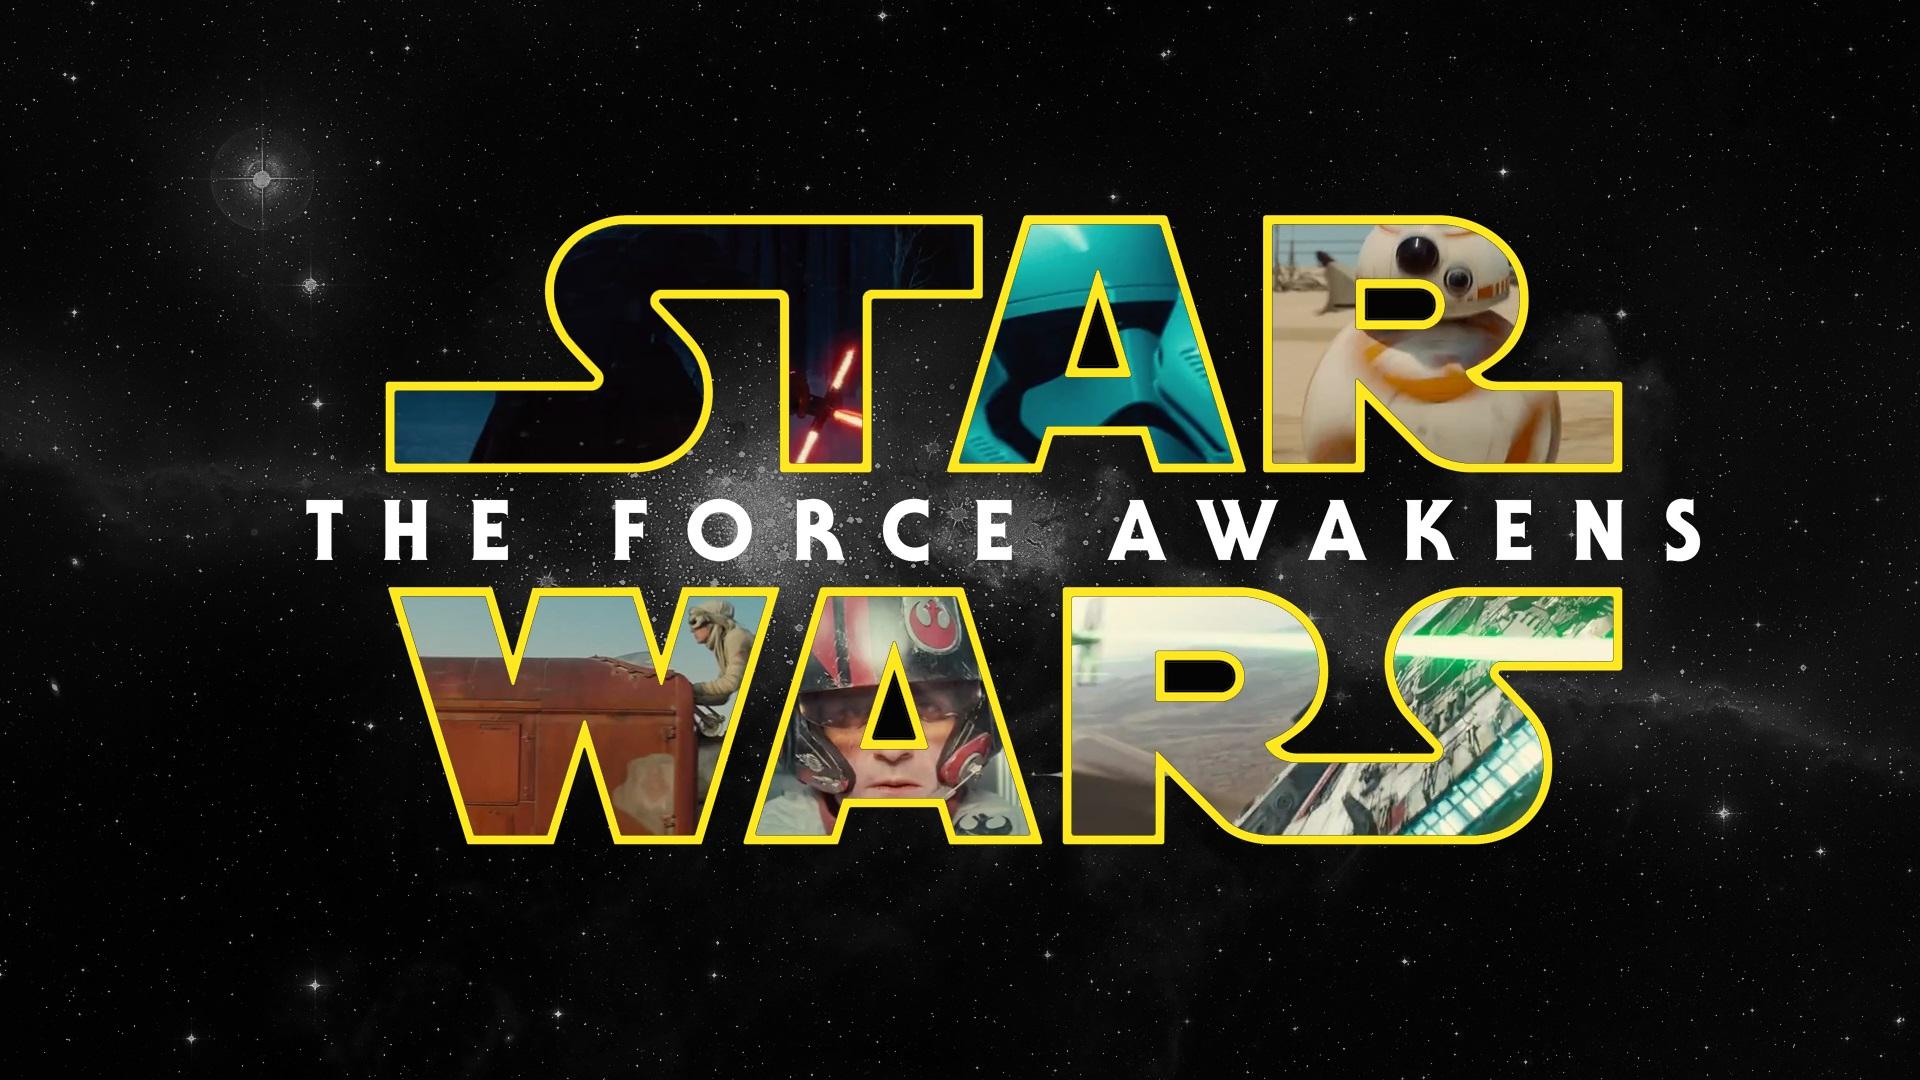 Star Wars The Force Awakens wallpaper 1 1920x1080